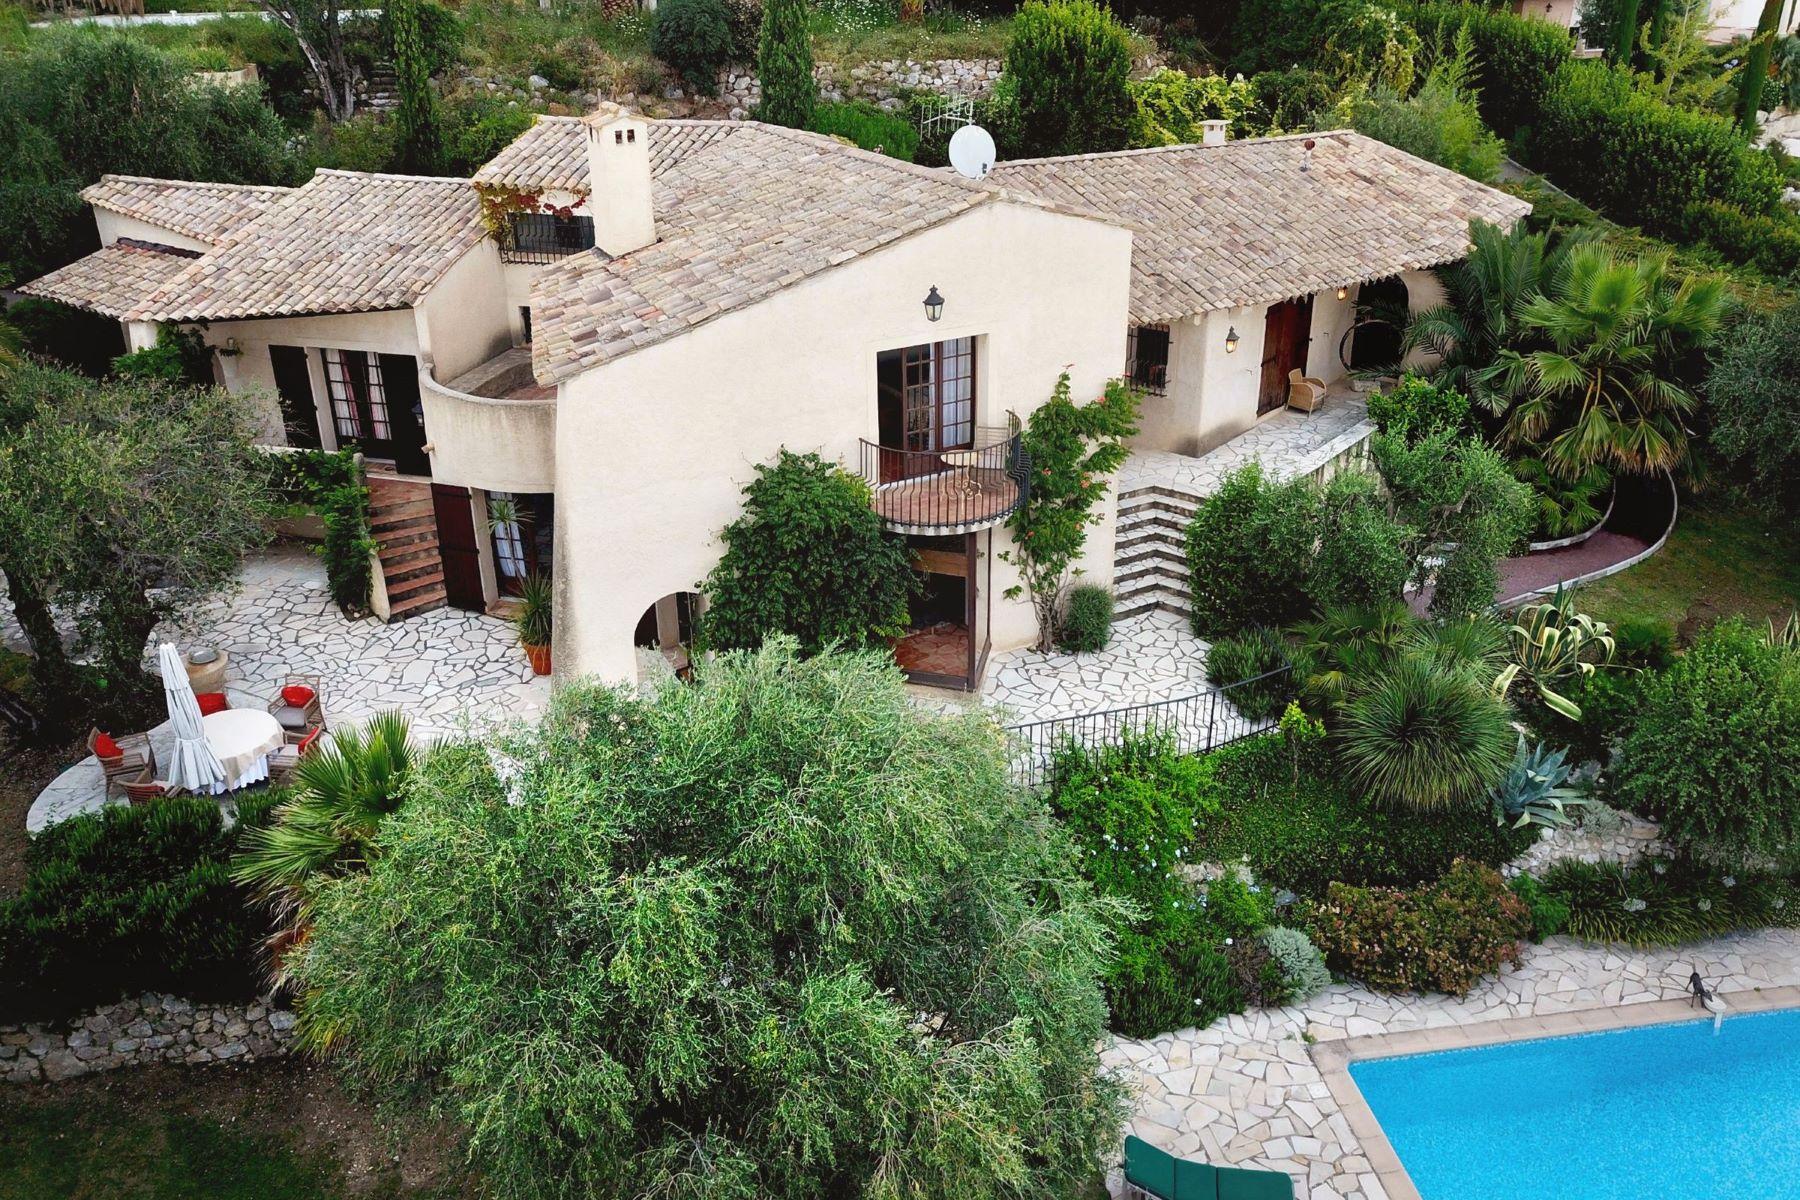 Single Family Homes por un Venta en For sale in Vence - charming provençal home in a quiet neighbourhood. Vence, Provincia - Alpes - Costa Azul 06140 Francia